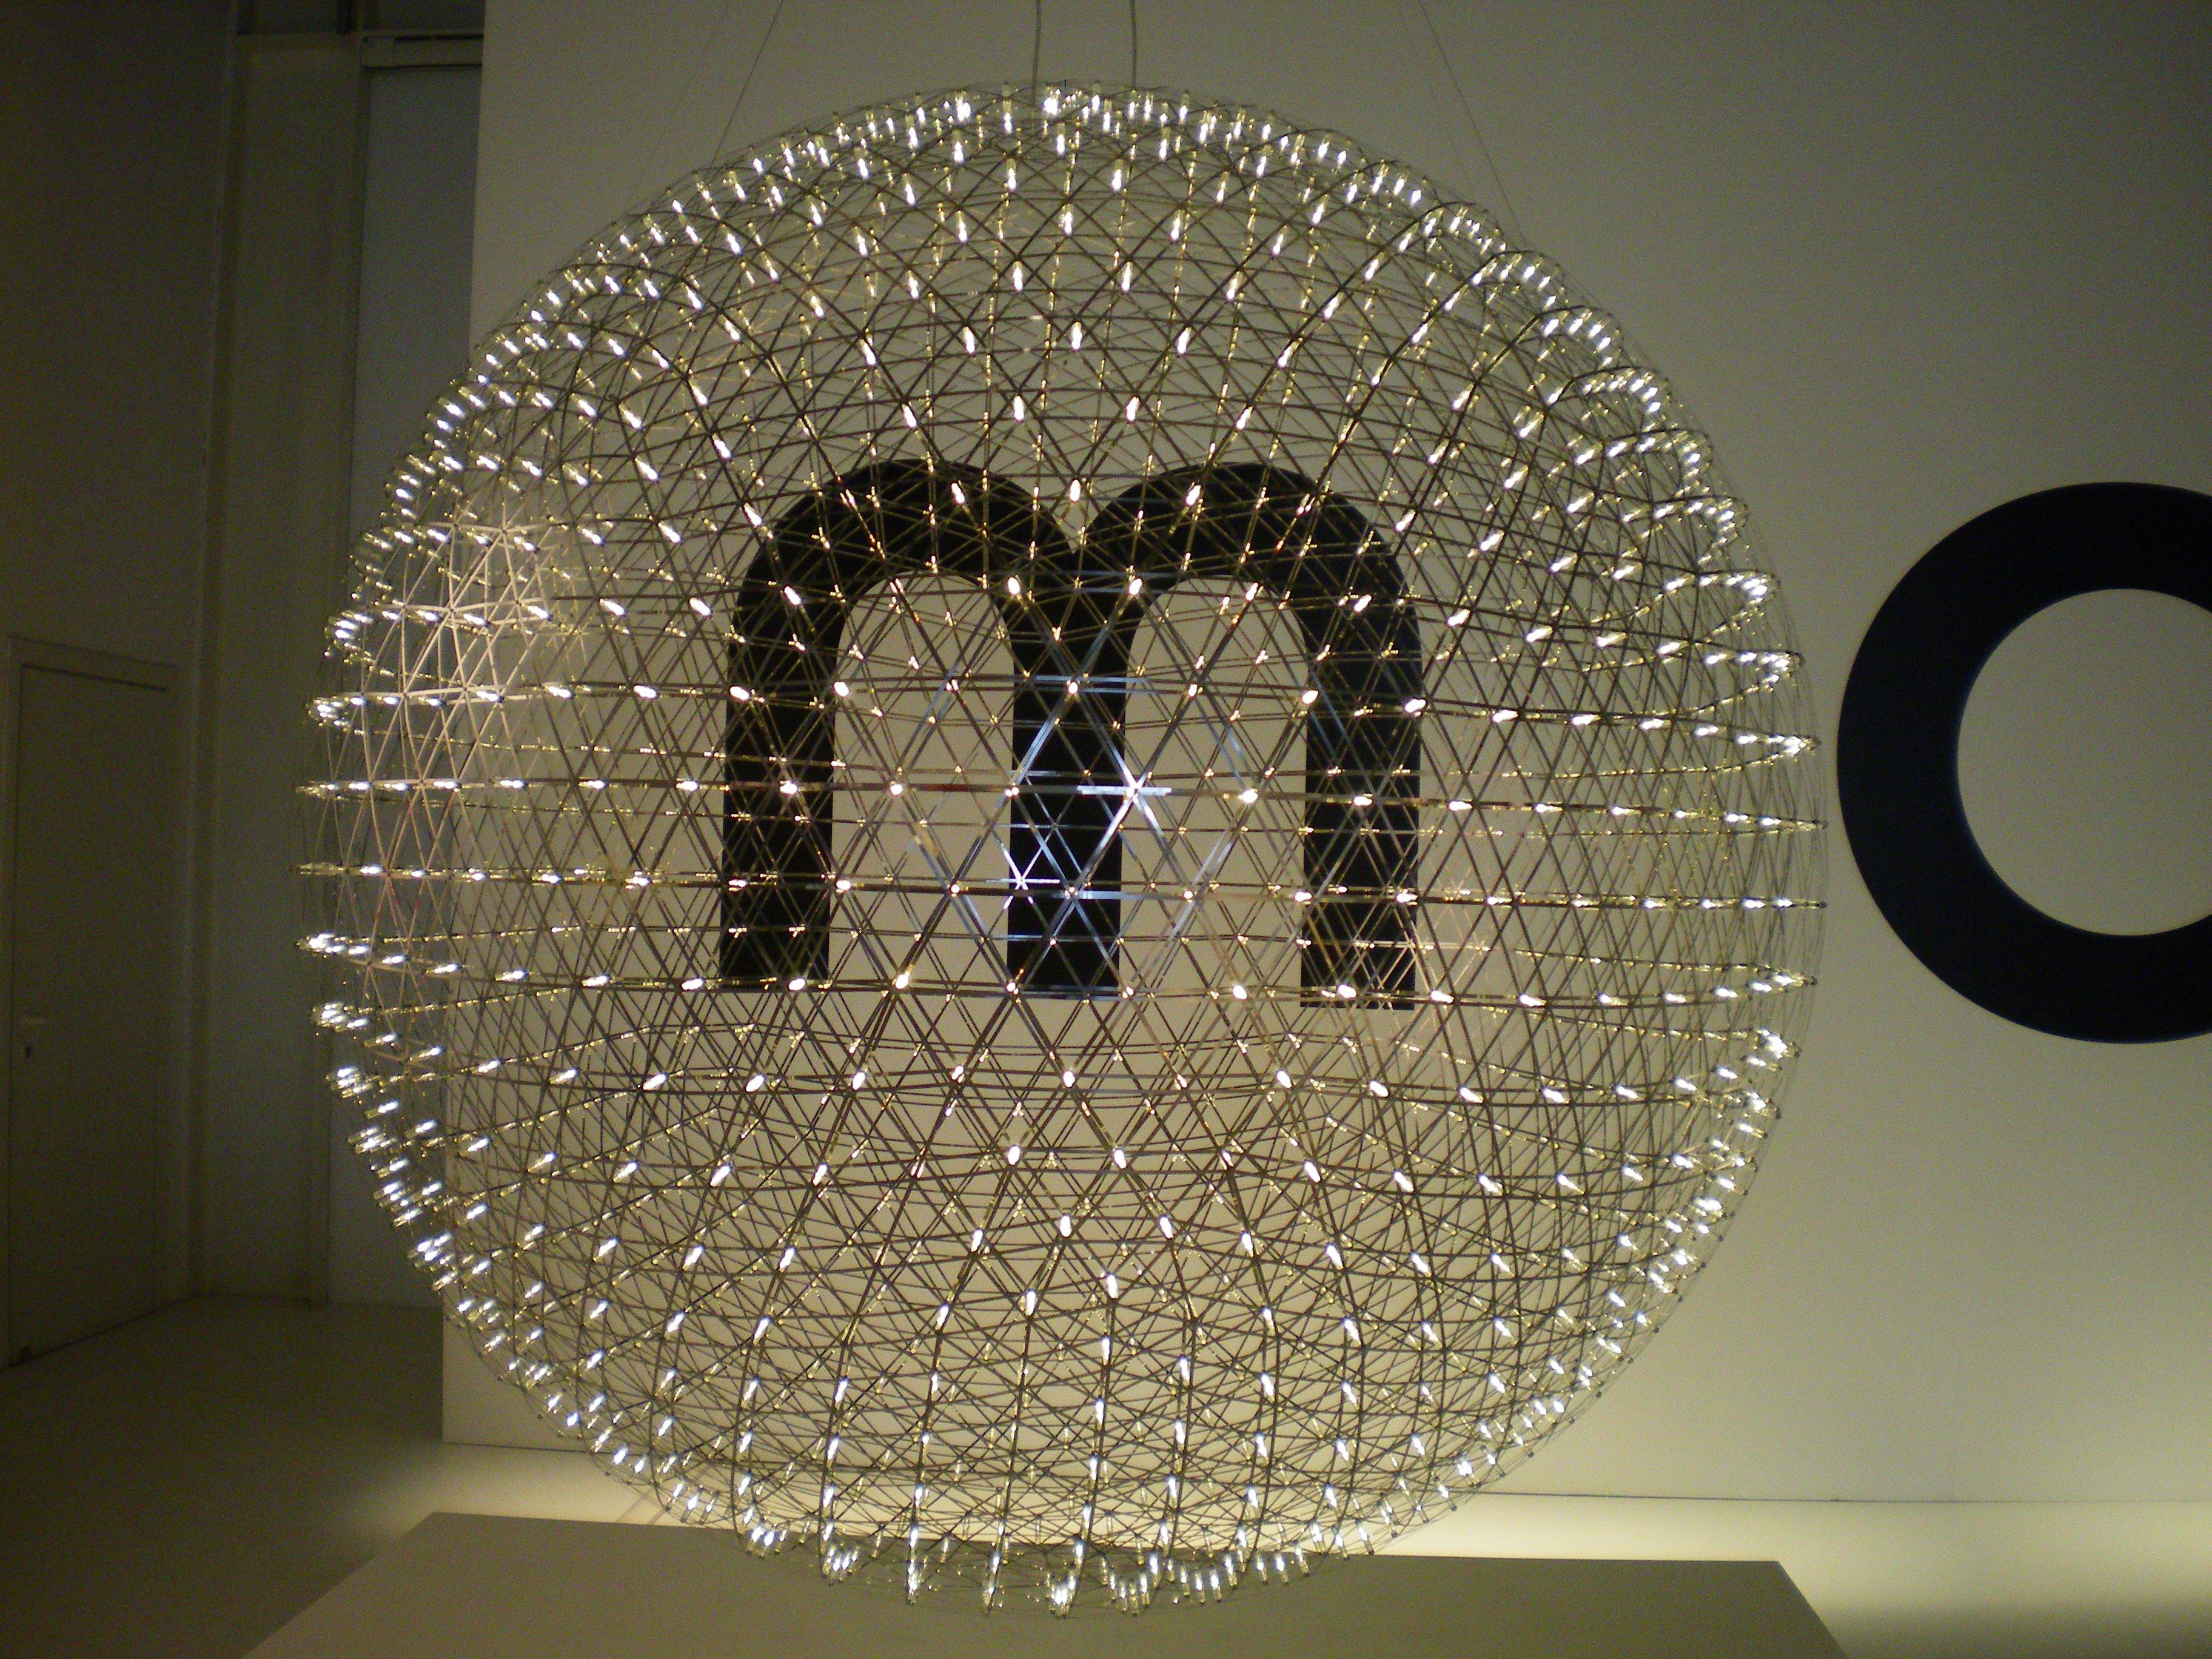 LED lamp Raimod by Raimond Puts for moooi ... as seen in Milan 2009